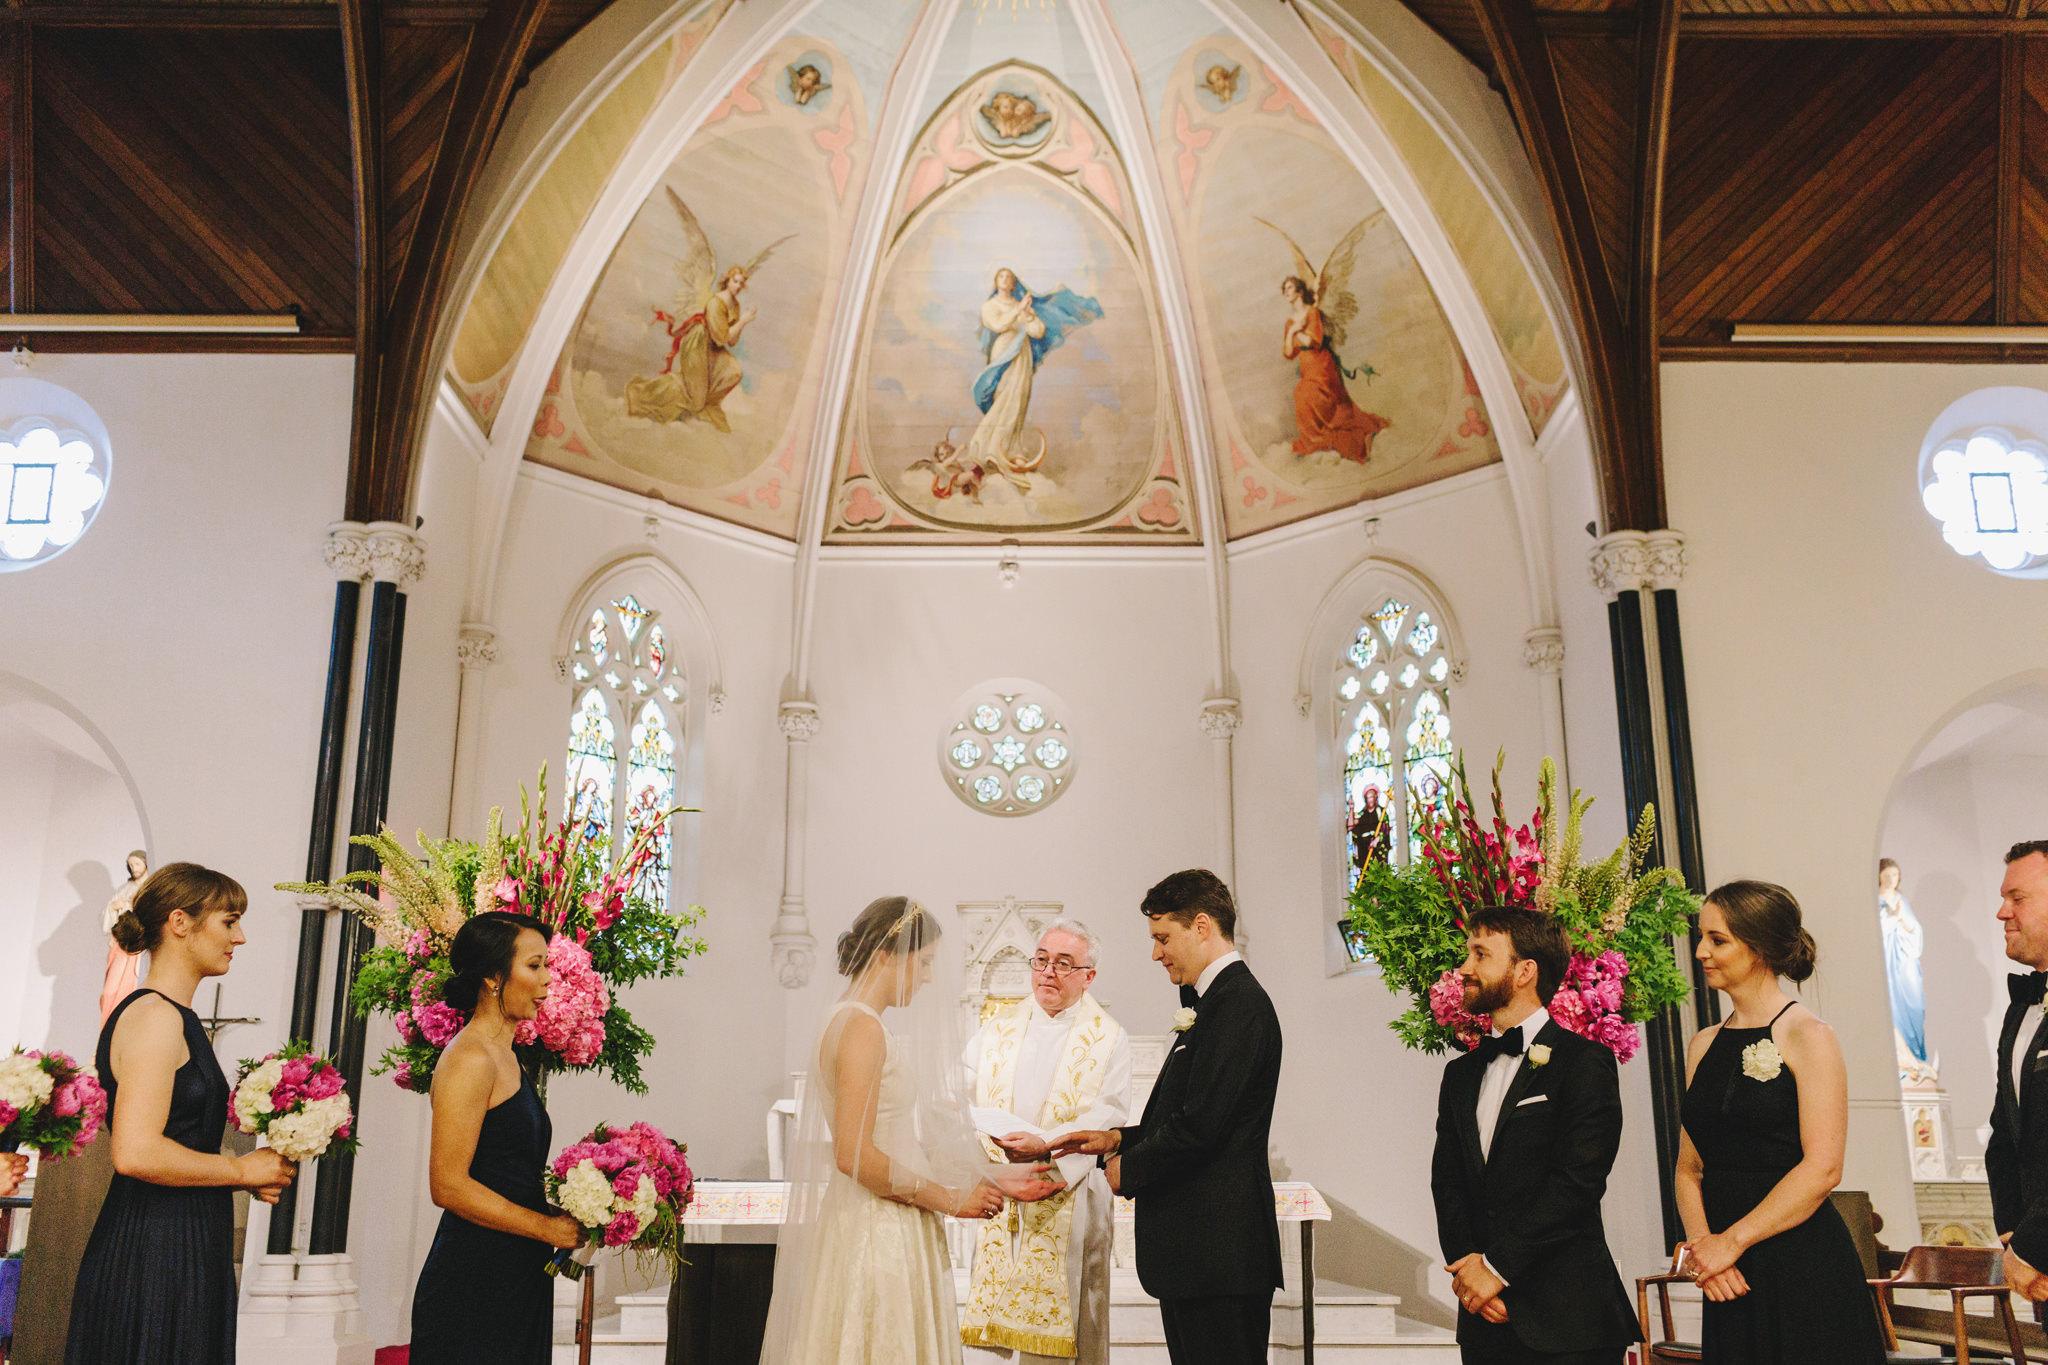 Abbotsford_Convent_Wedding_Peter_Anna062.JPG